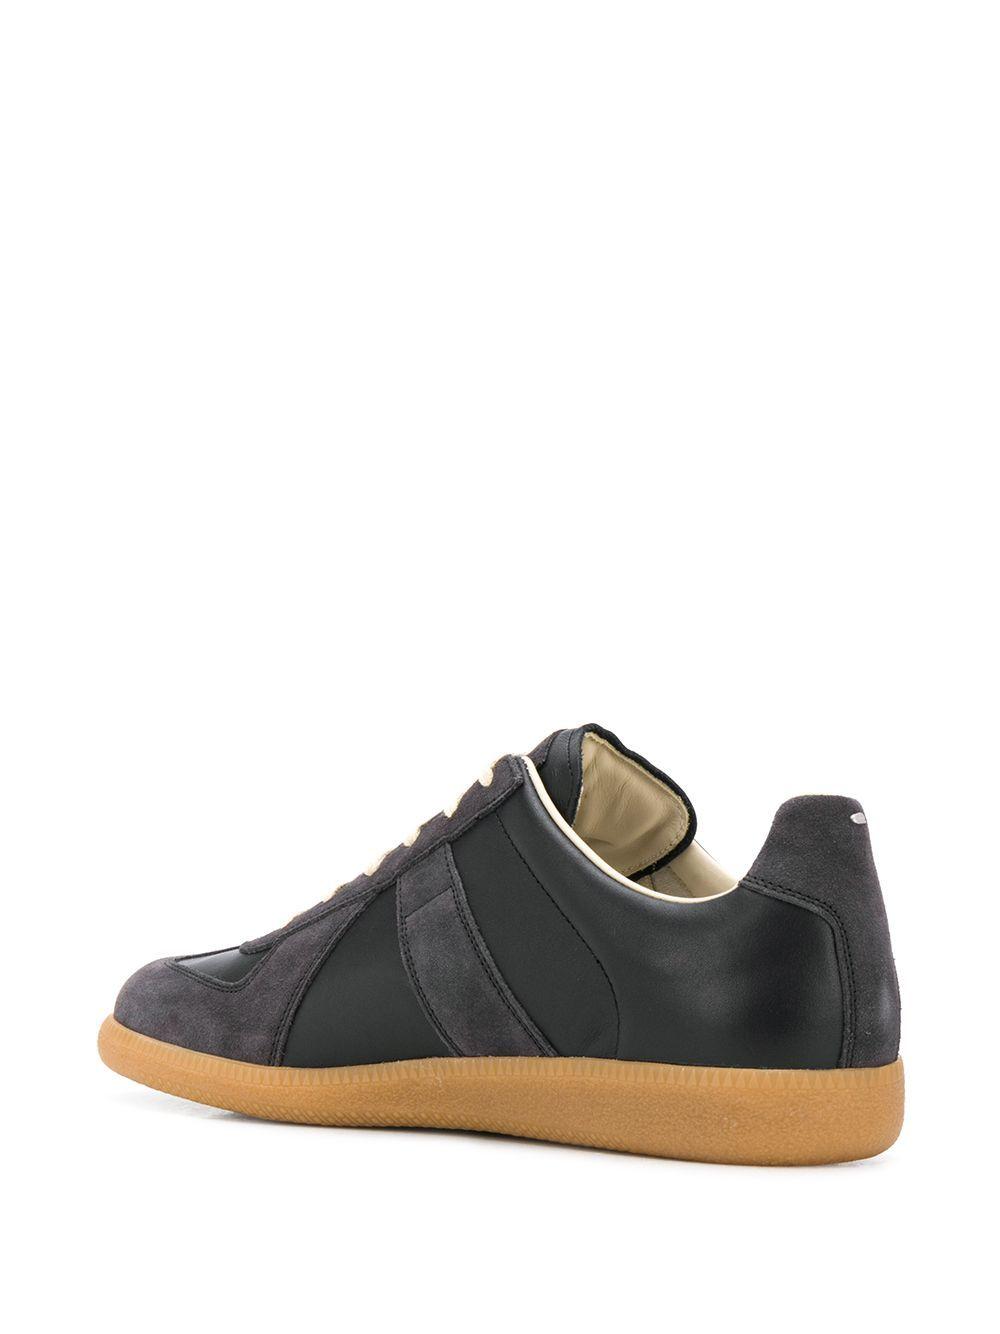 REPLICA SNEAKERS MAN MAISON MARGIELA | Sneakers | S57WS0236 P1895900